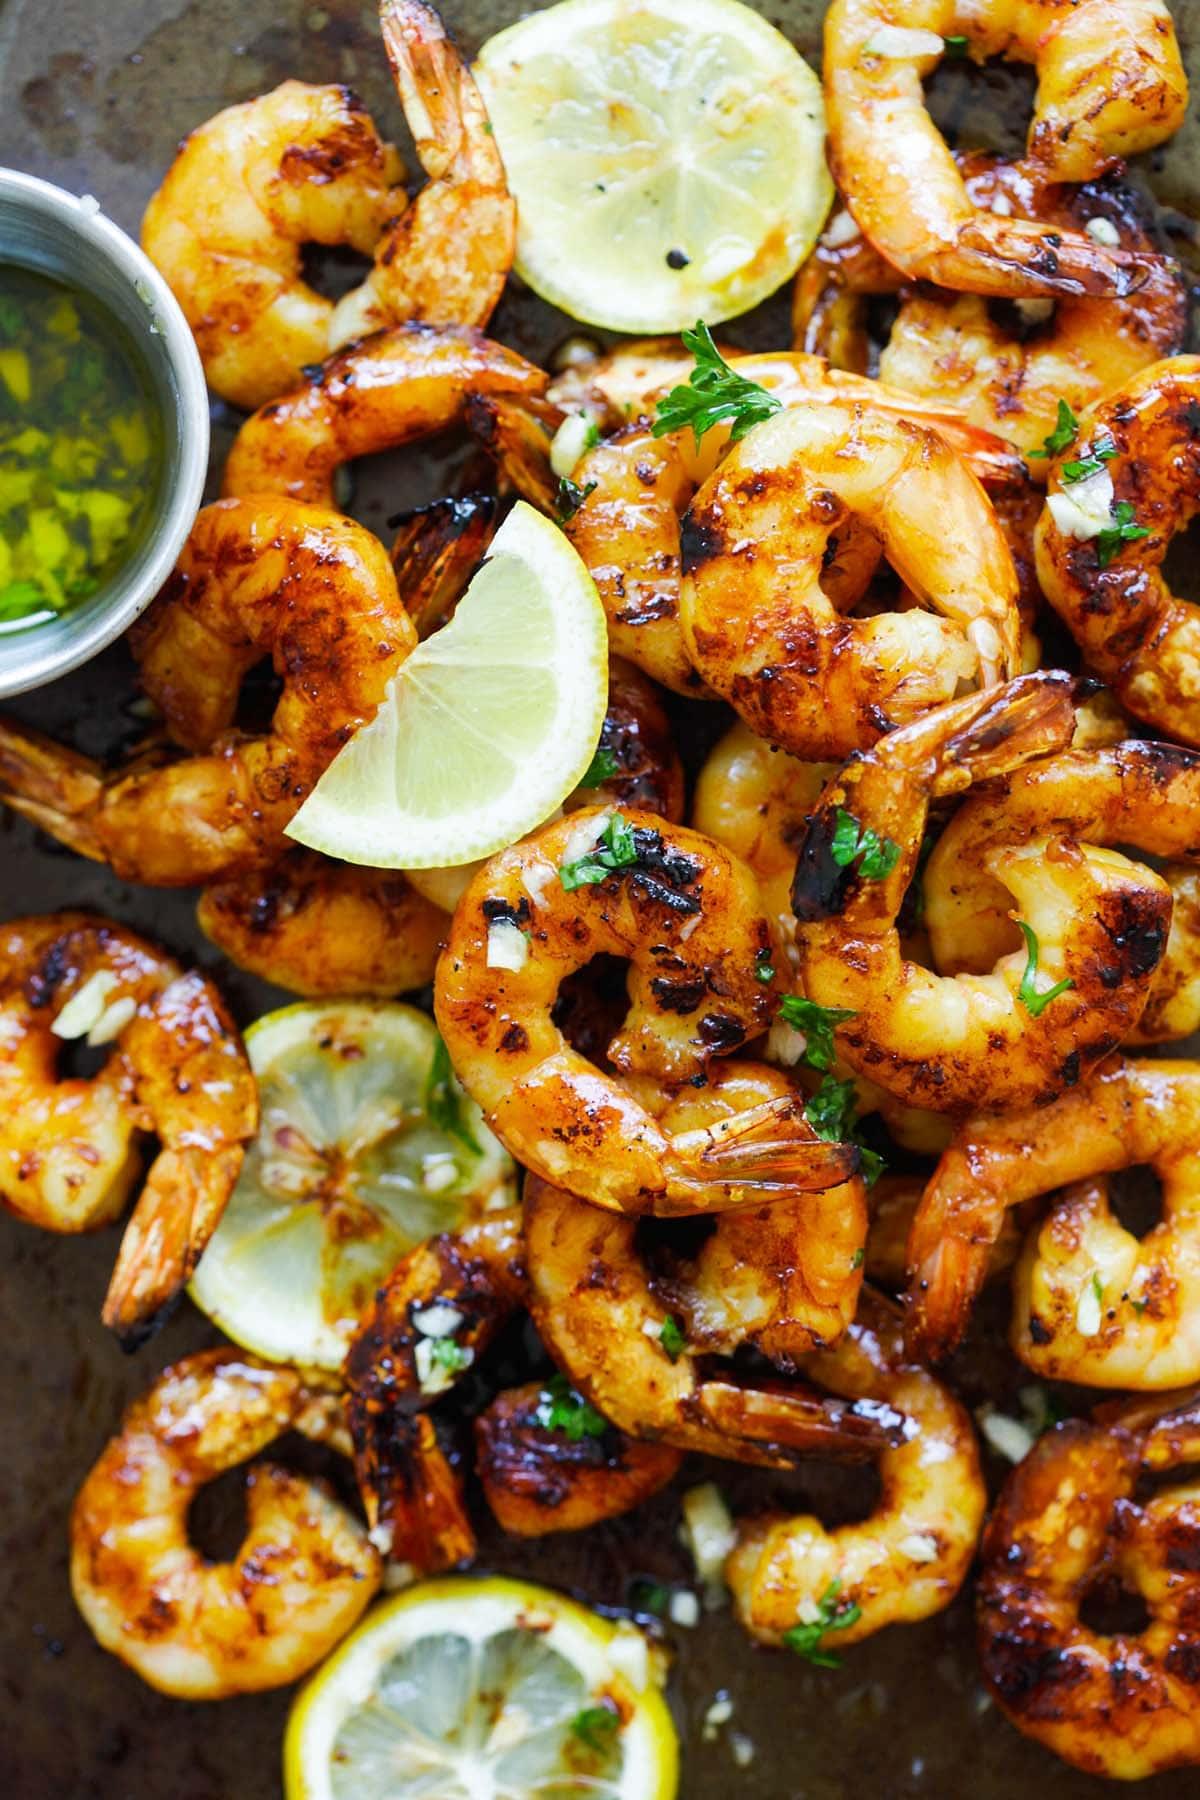 Grilled shrimp recipe with honey Cajun seasonings.